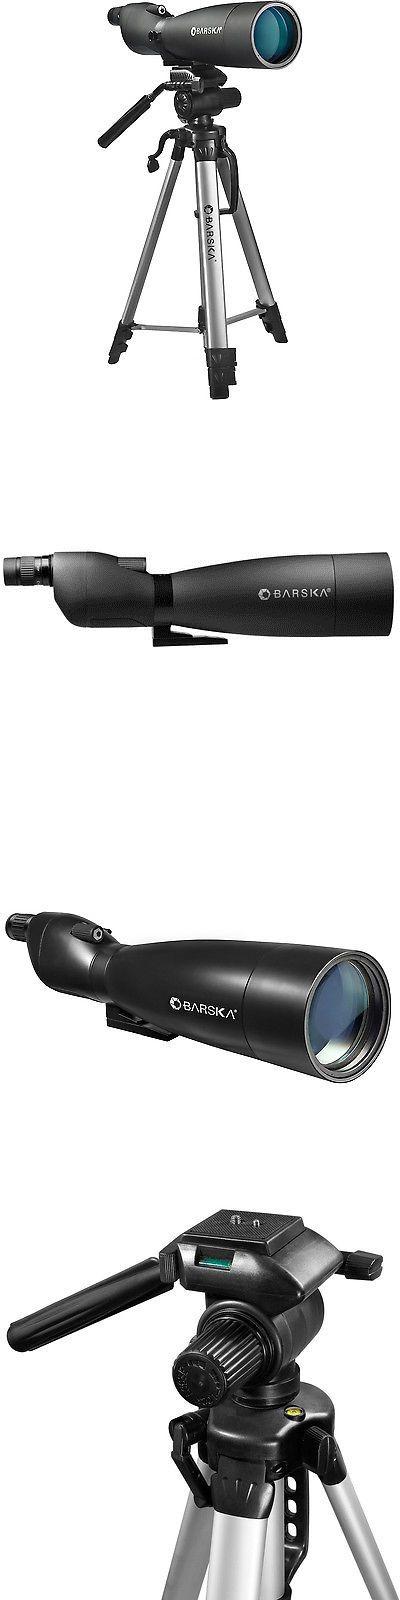 Other Hunting Scopes and Optics 7307: Barska Da12194 30-90X90 90Mm Optical Lens Wp Colorado Spotting Scope W Tripod -> BUY IT NOW ONLY: $166.99 on eBay!